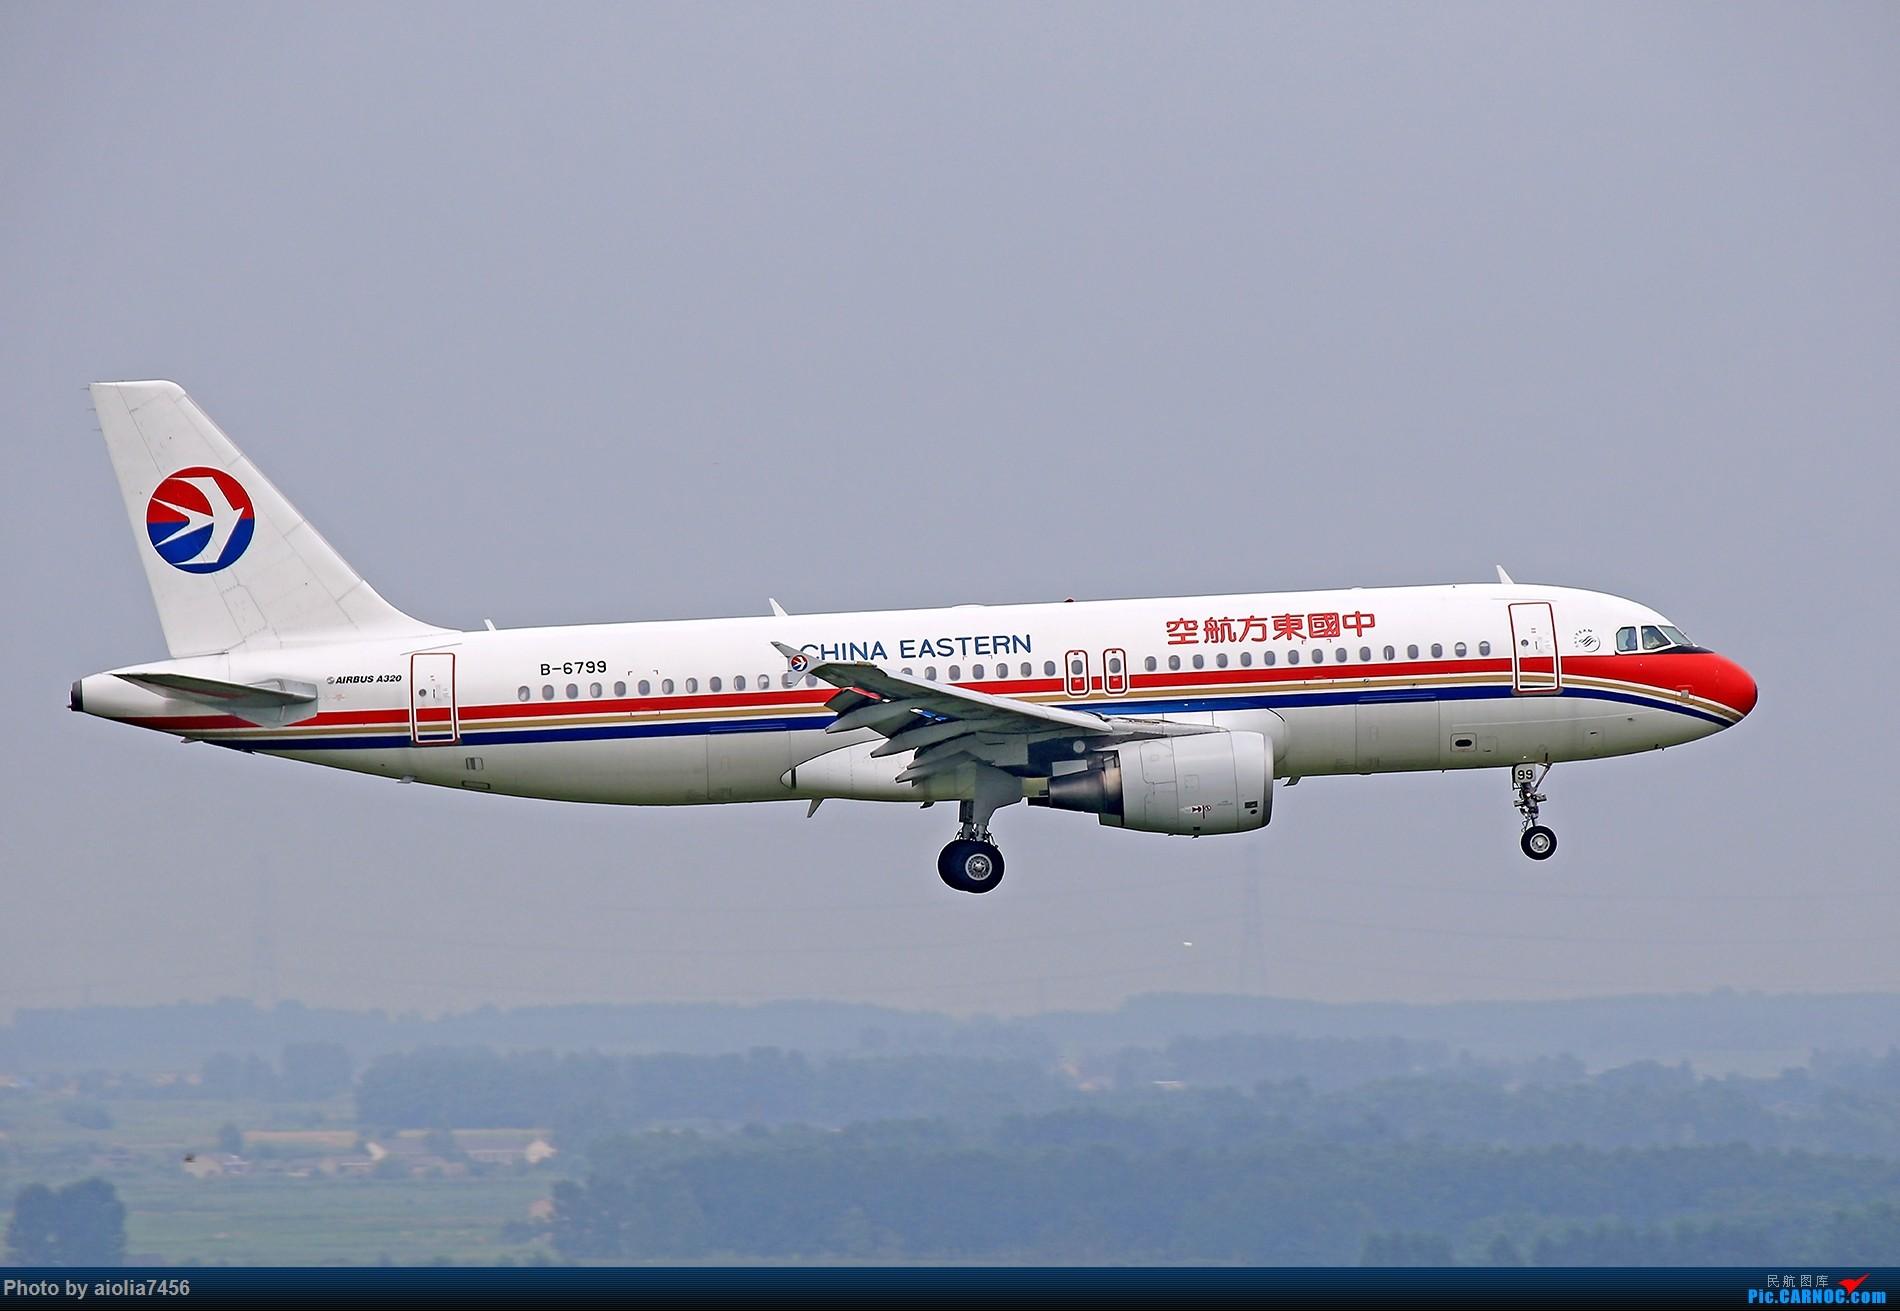 Re:[原创]新桥桑拿天,上塔晒晒,我要古铜色~! AIRBUS A320-200 B-6799 中国合肥新桥国际机场